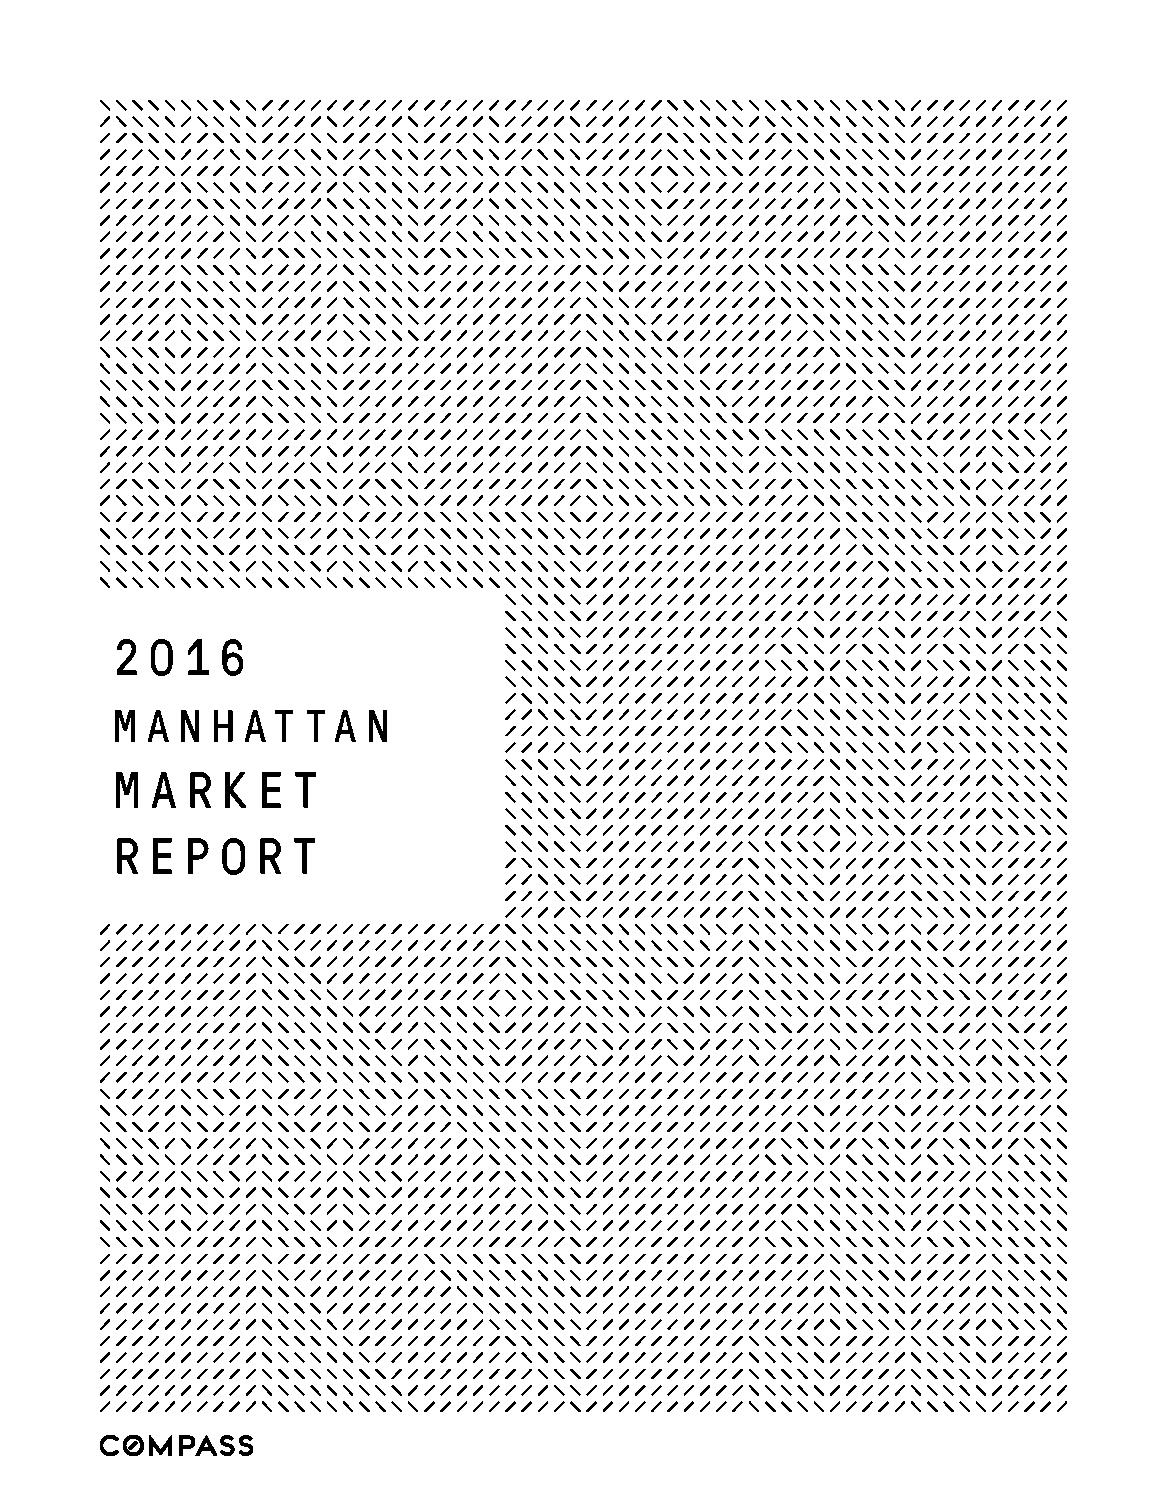 Hot Off The Press!    COMPASS Q3 Market Report  Request A Copy HERE